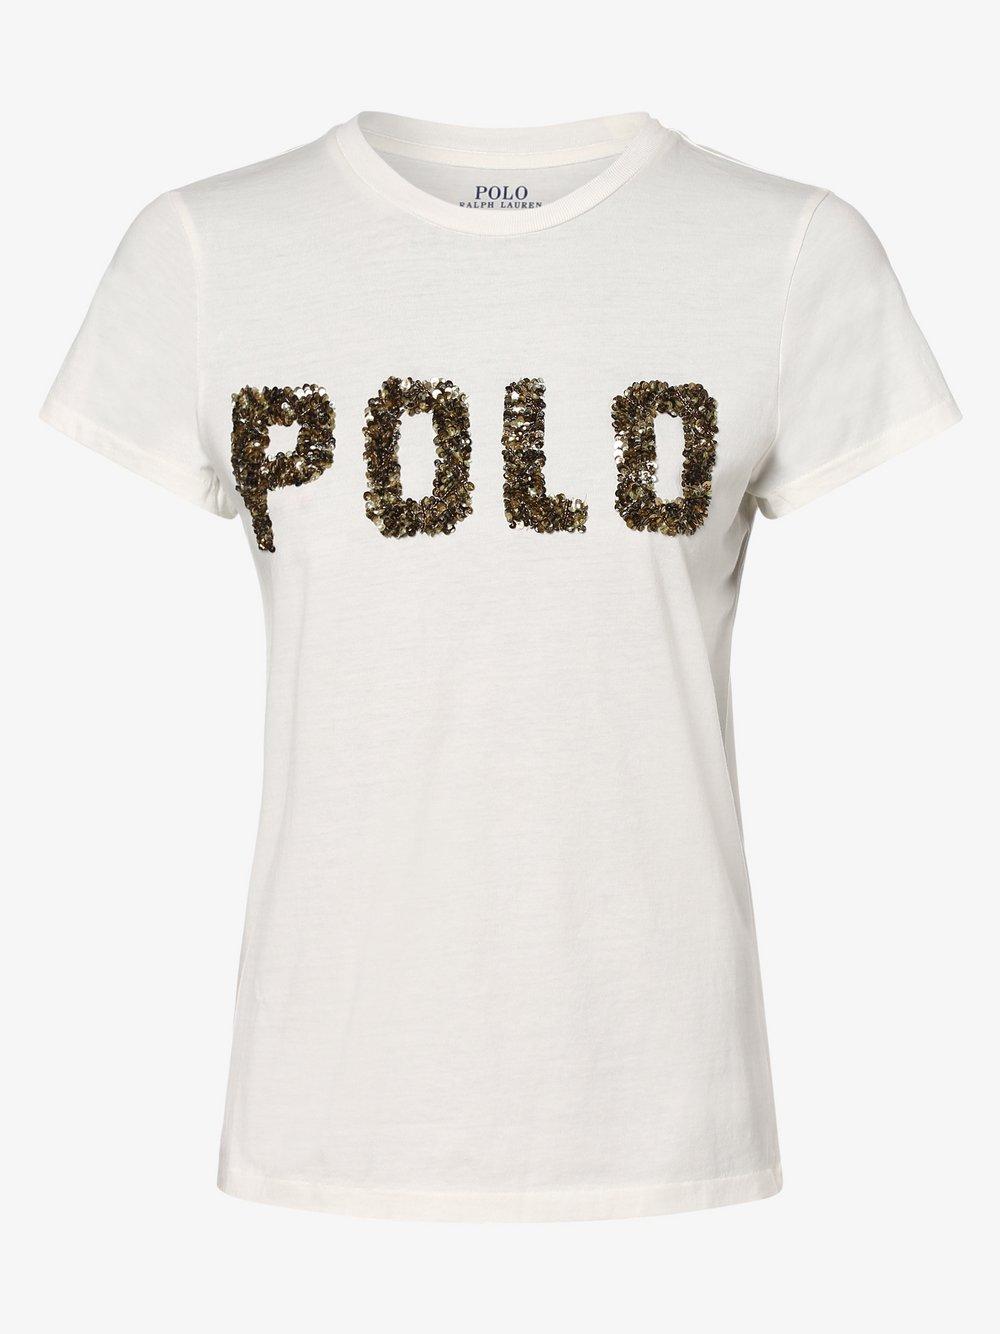 Polo Ralph Lauren - T-shirt damski, beżowy